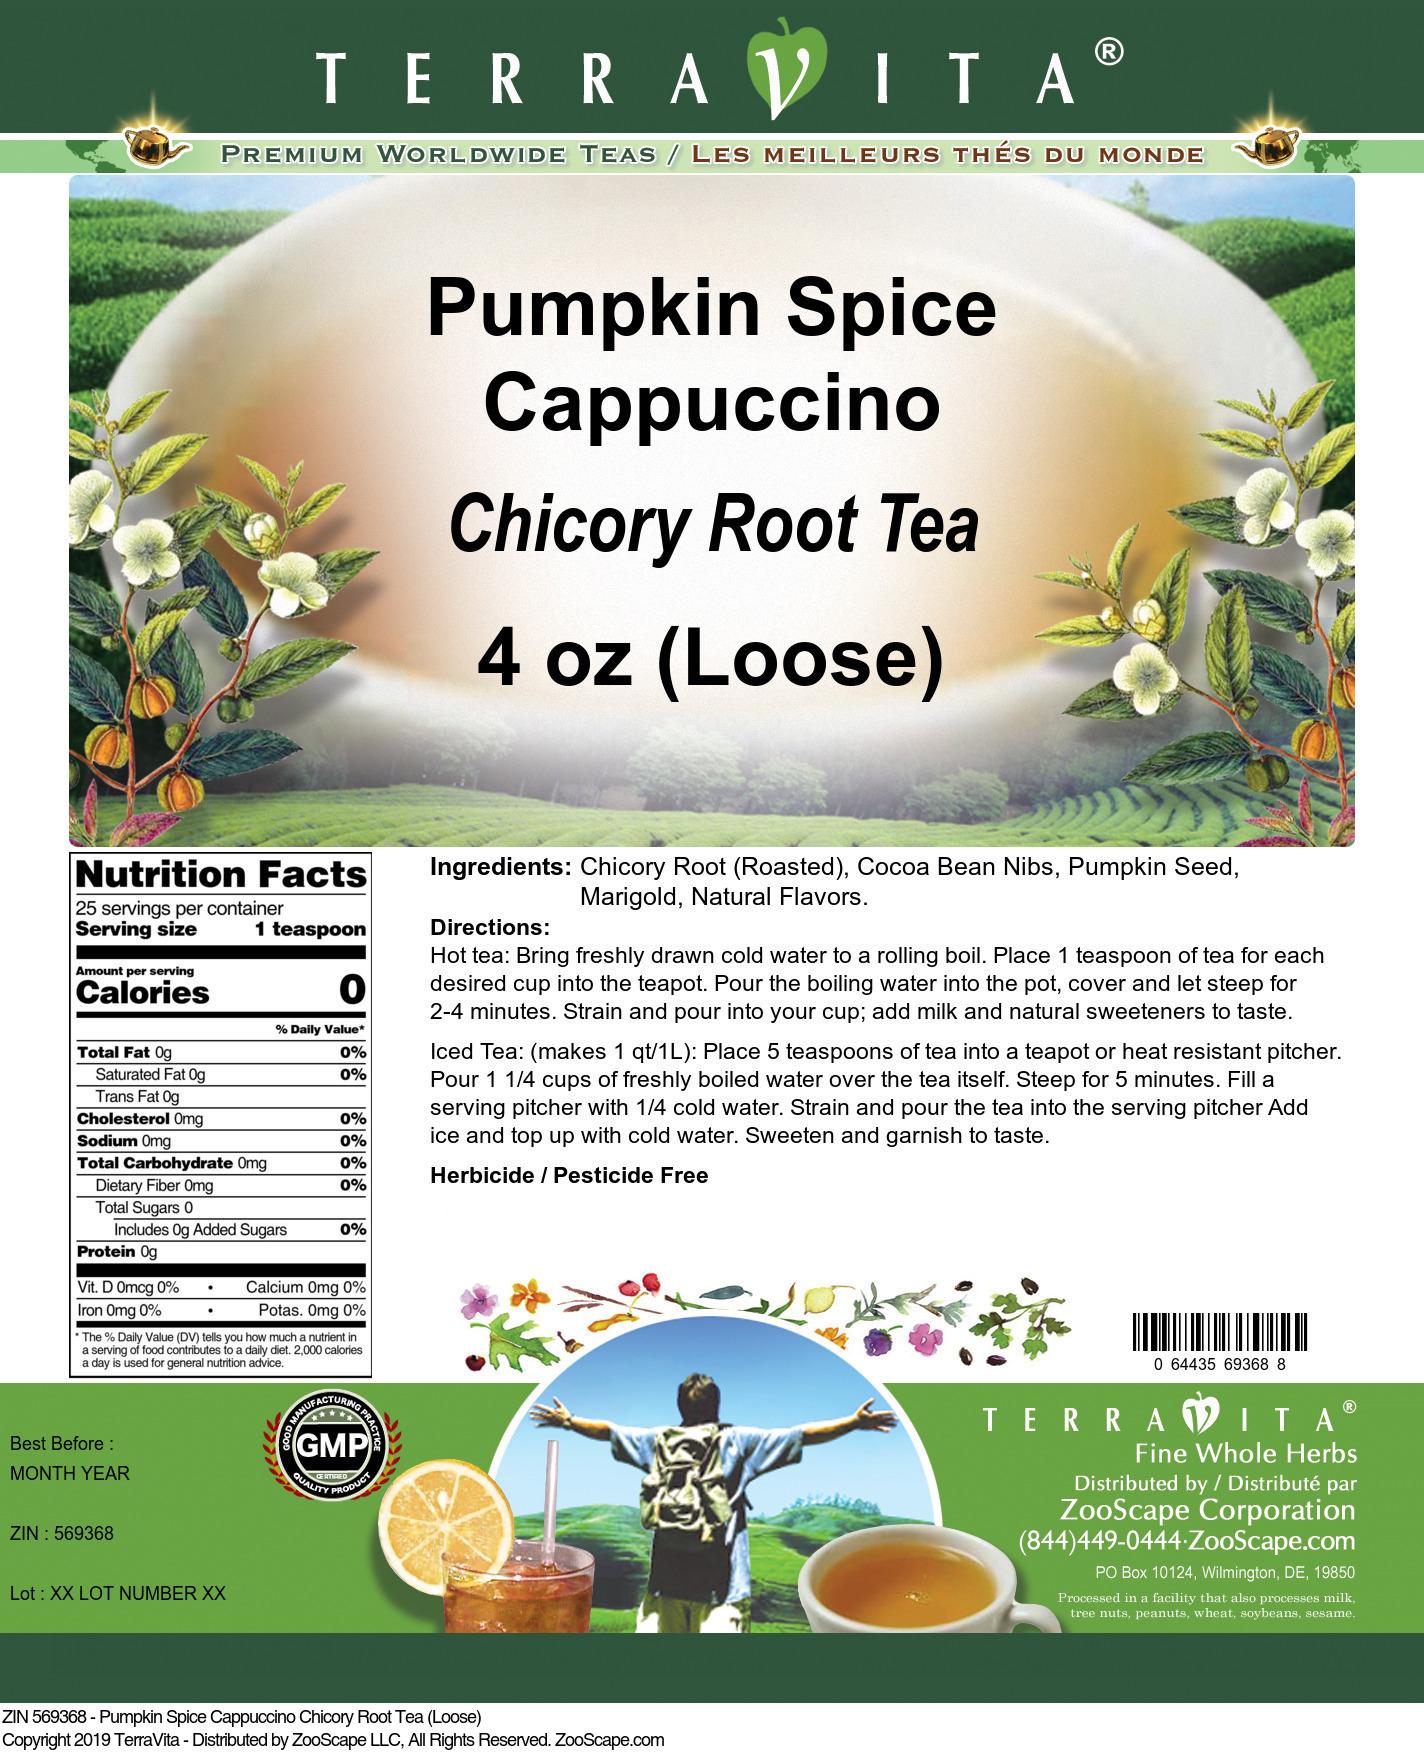 Pumpkin Spice Cappuccino Chicory Root Tea (Loose)